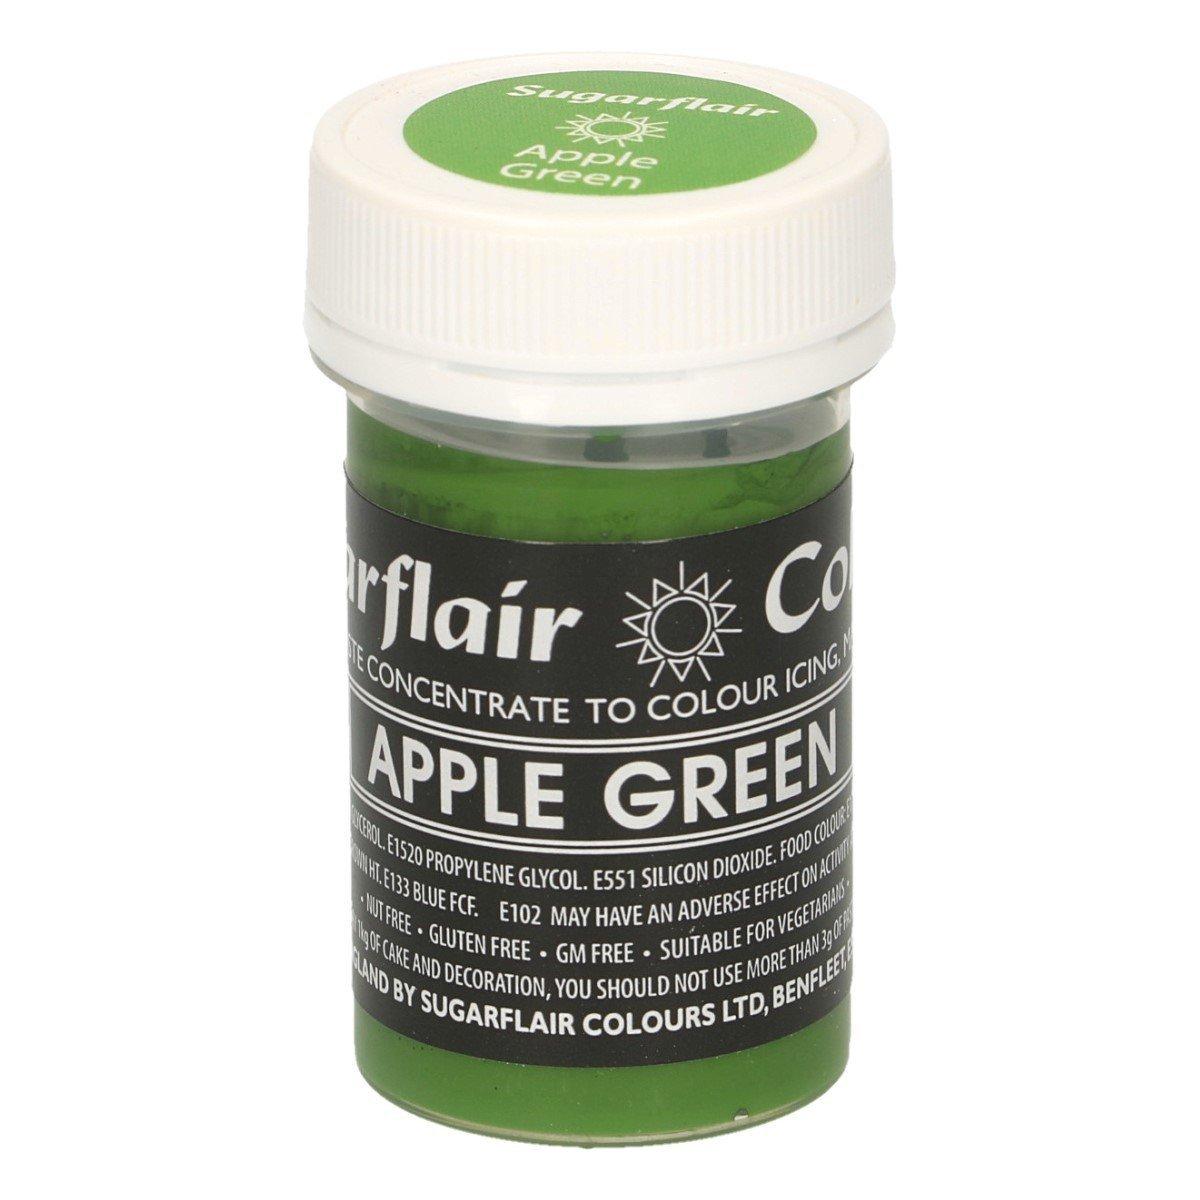 Sugarflair Paste Colour Pastel Apple Green 25g